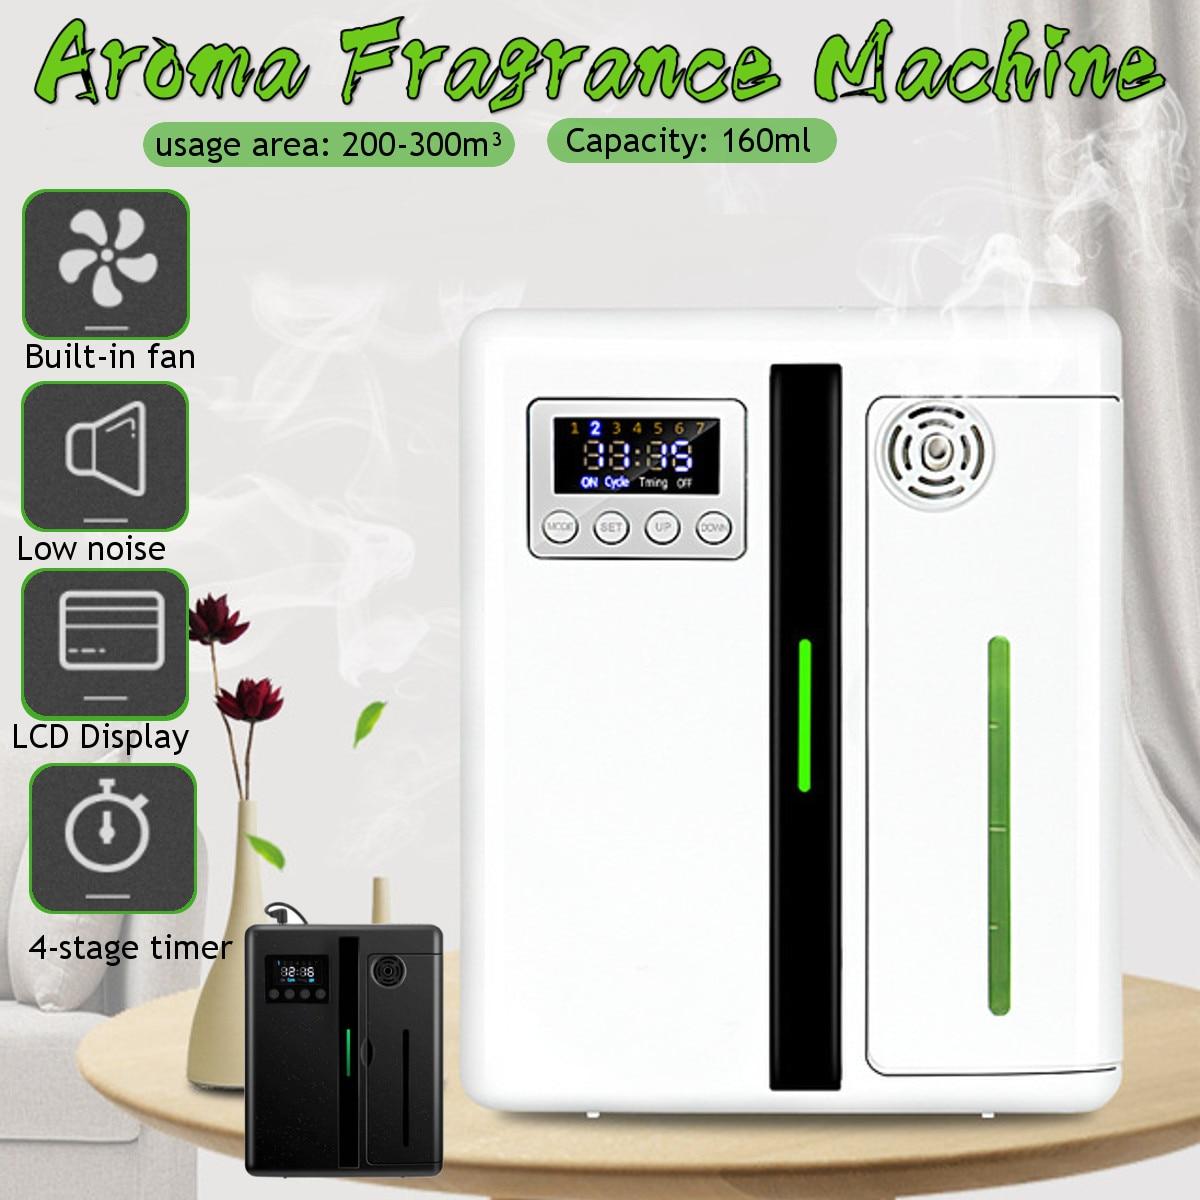 300m³ Lntelligent Aroma Fragrance Machine 160ml Timer Function Scent Unit Essential Oil Aroma Diffu